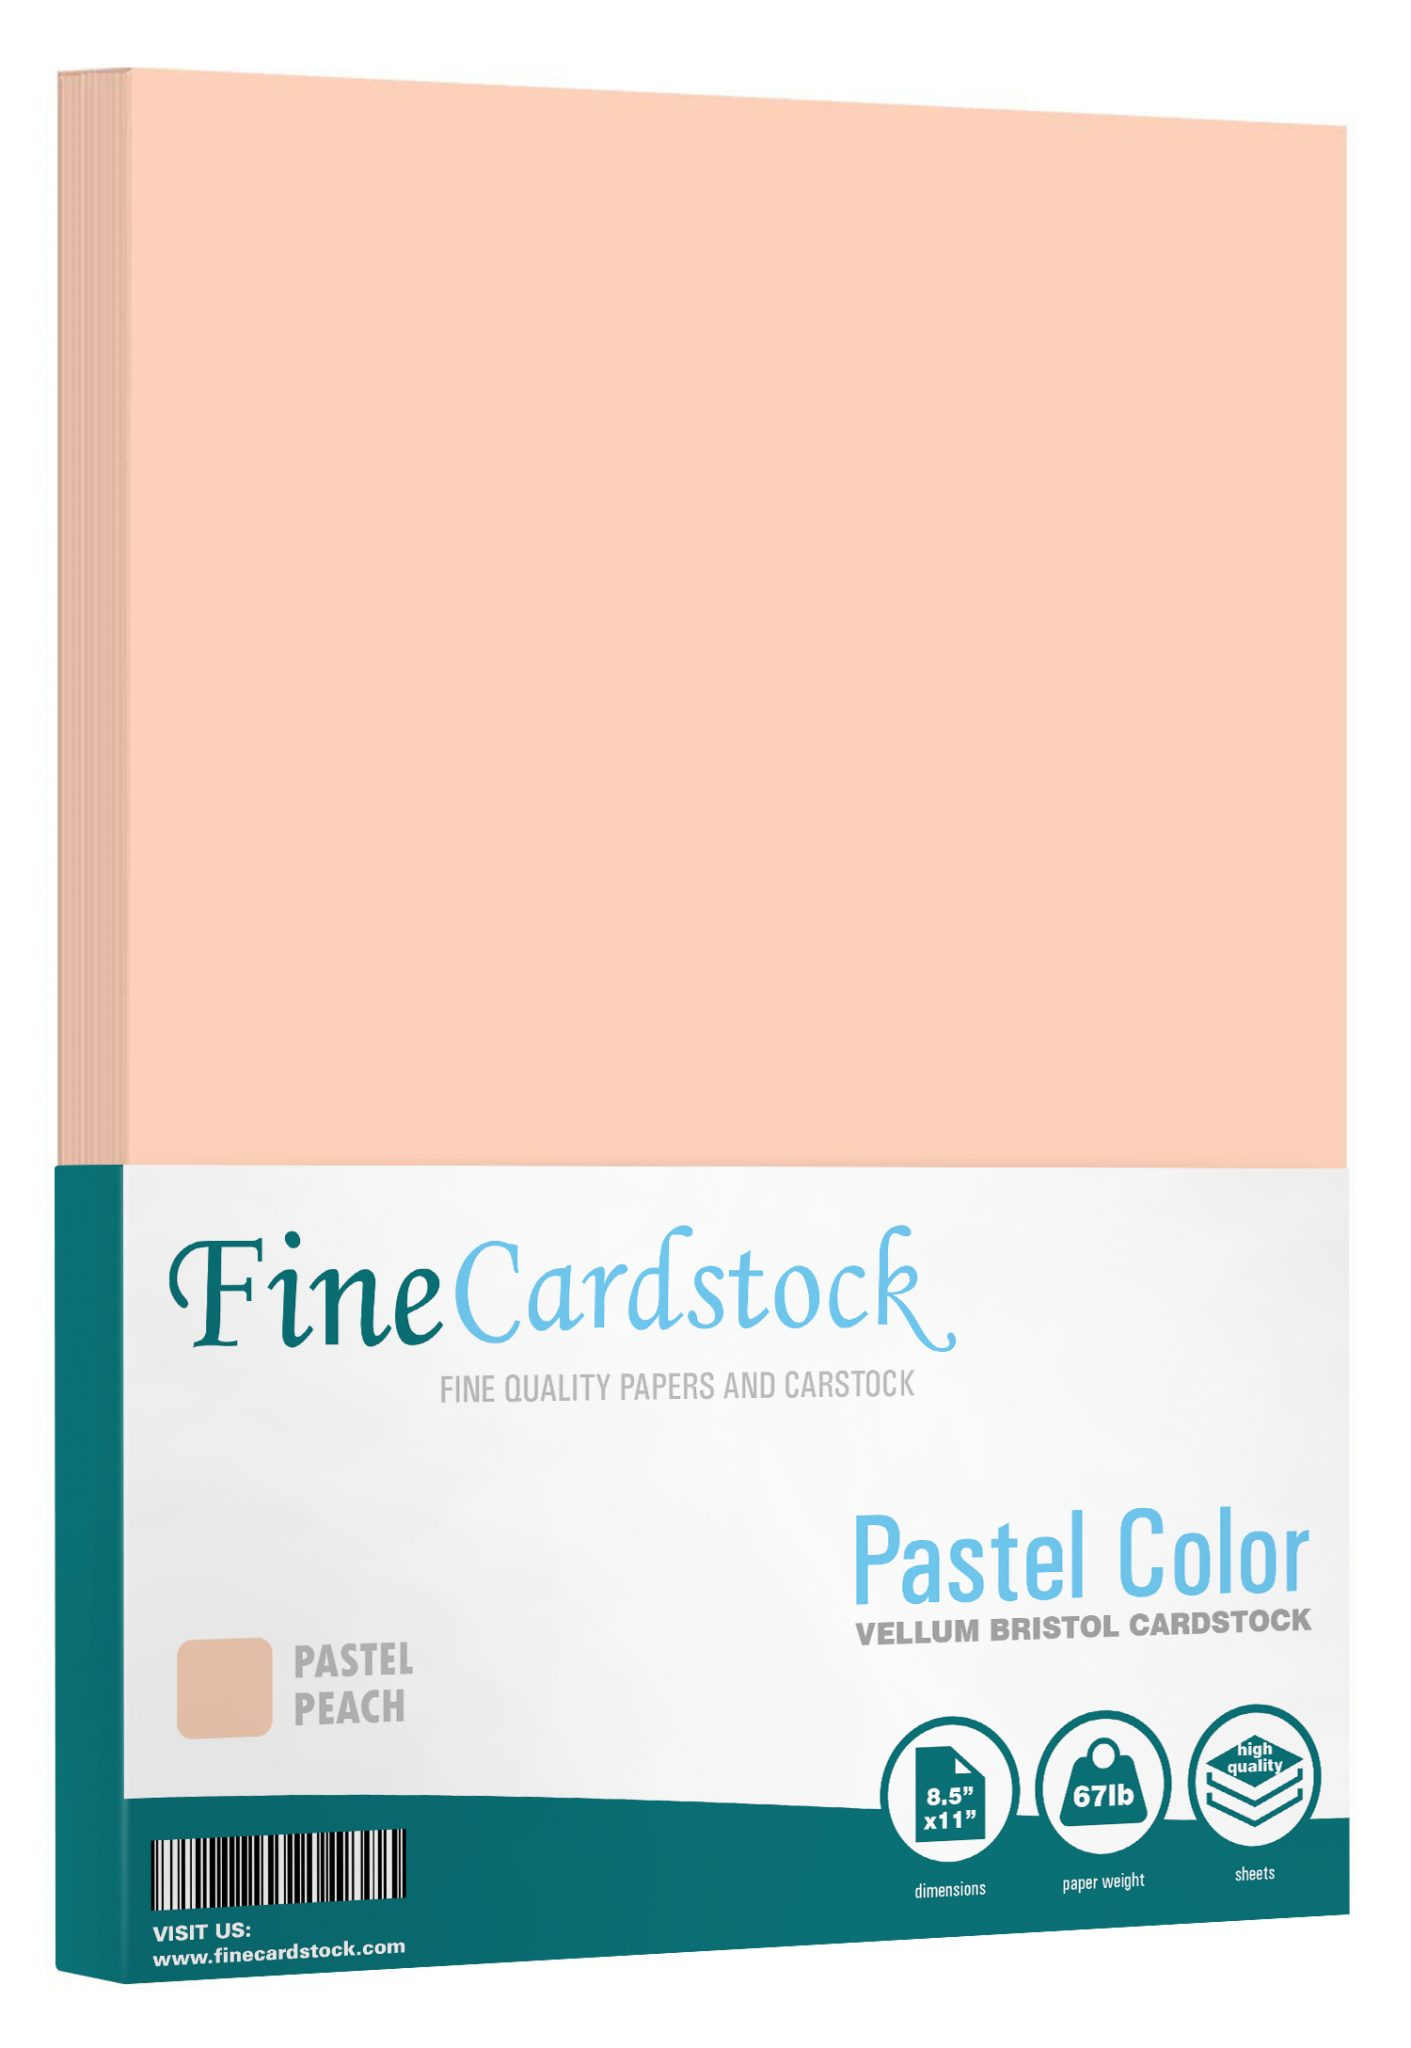 8 1/2 x 11 Pastel Cardstock